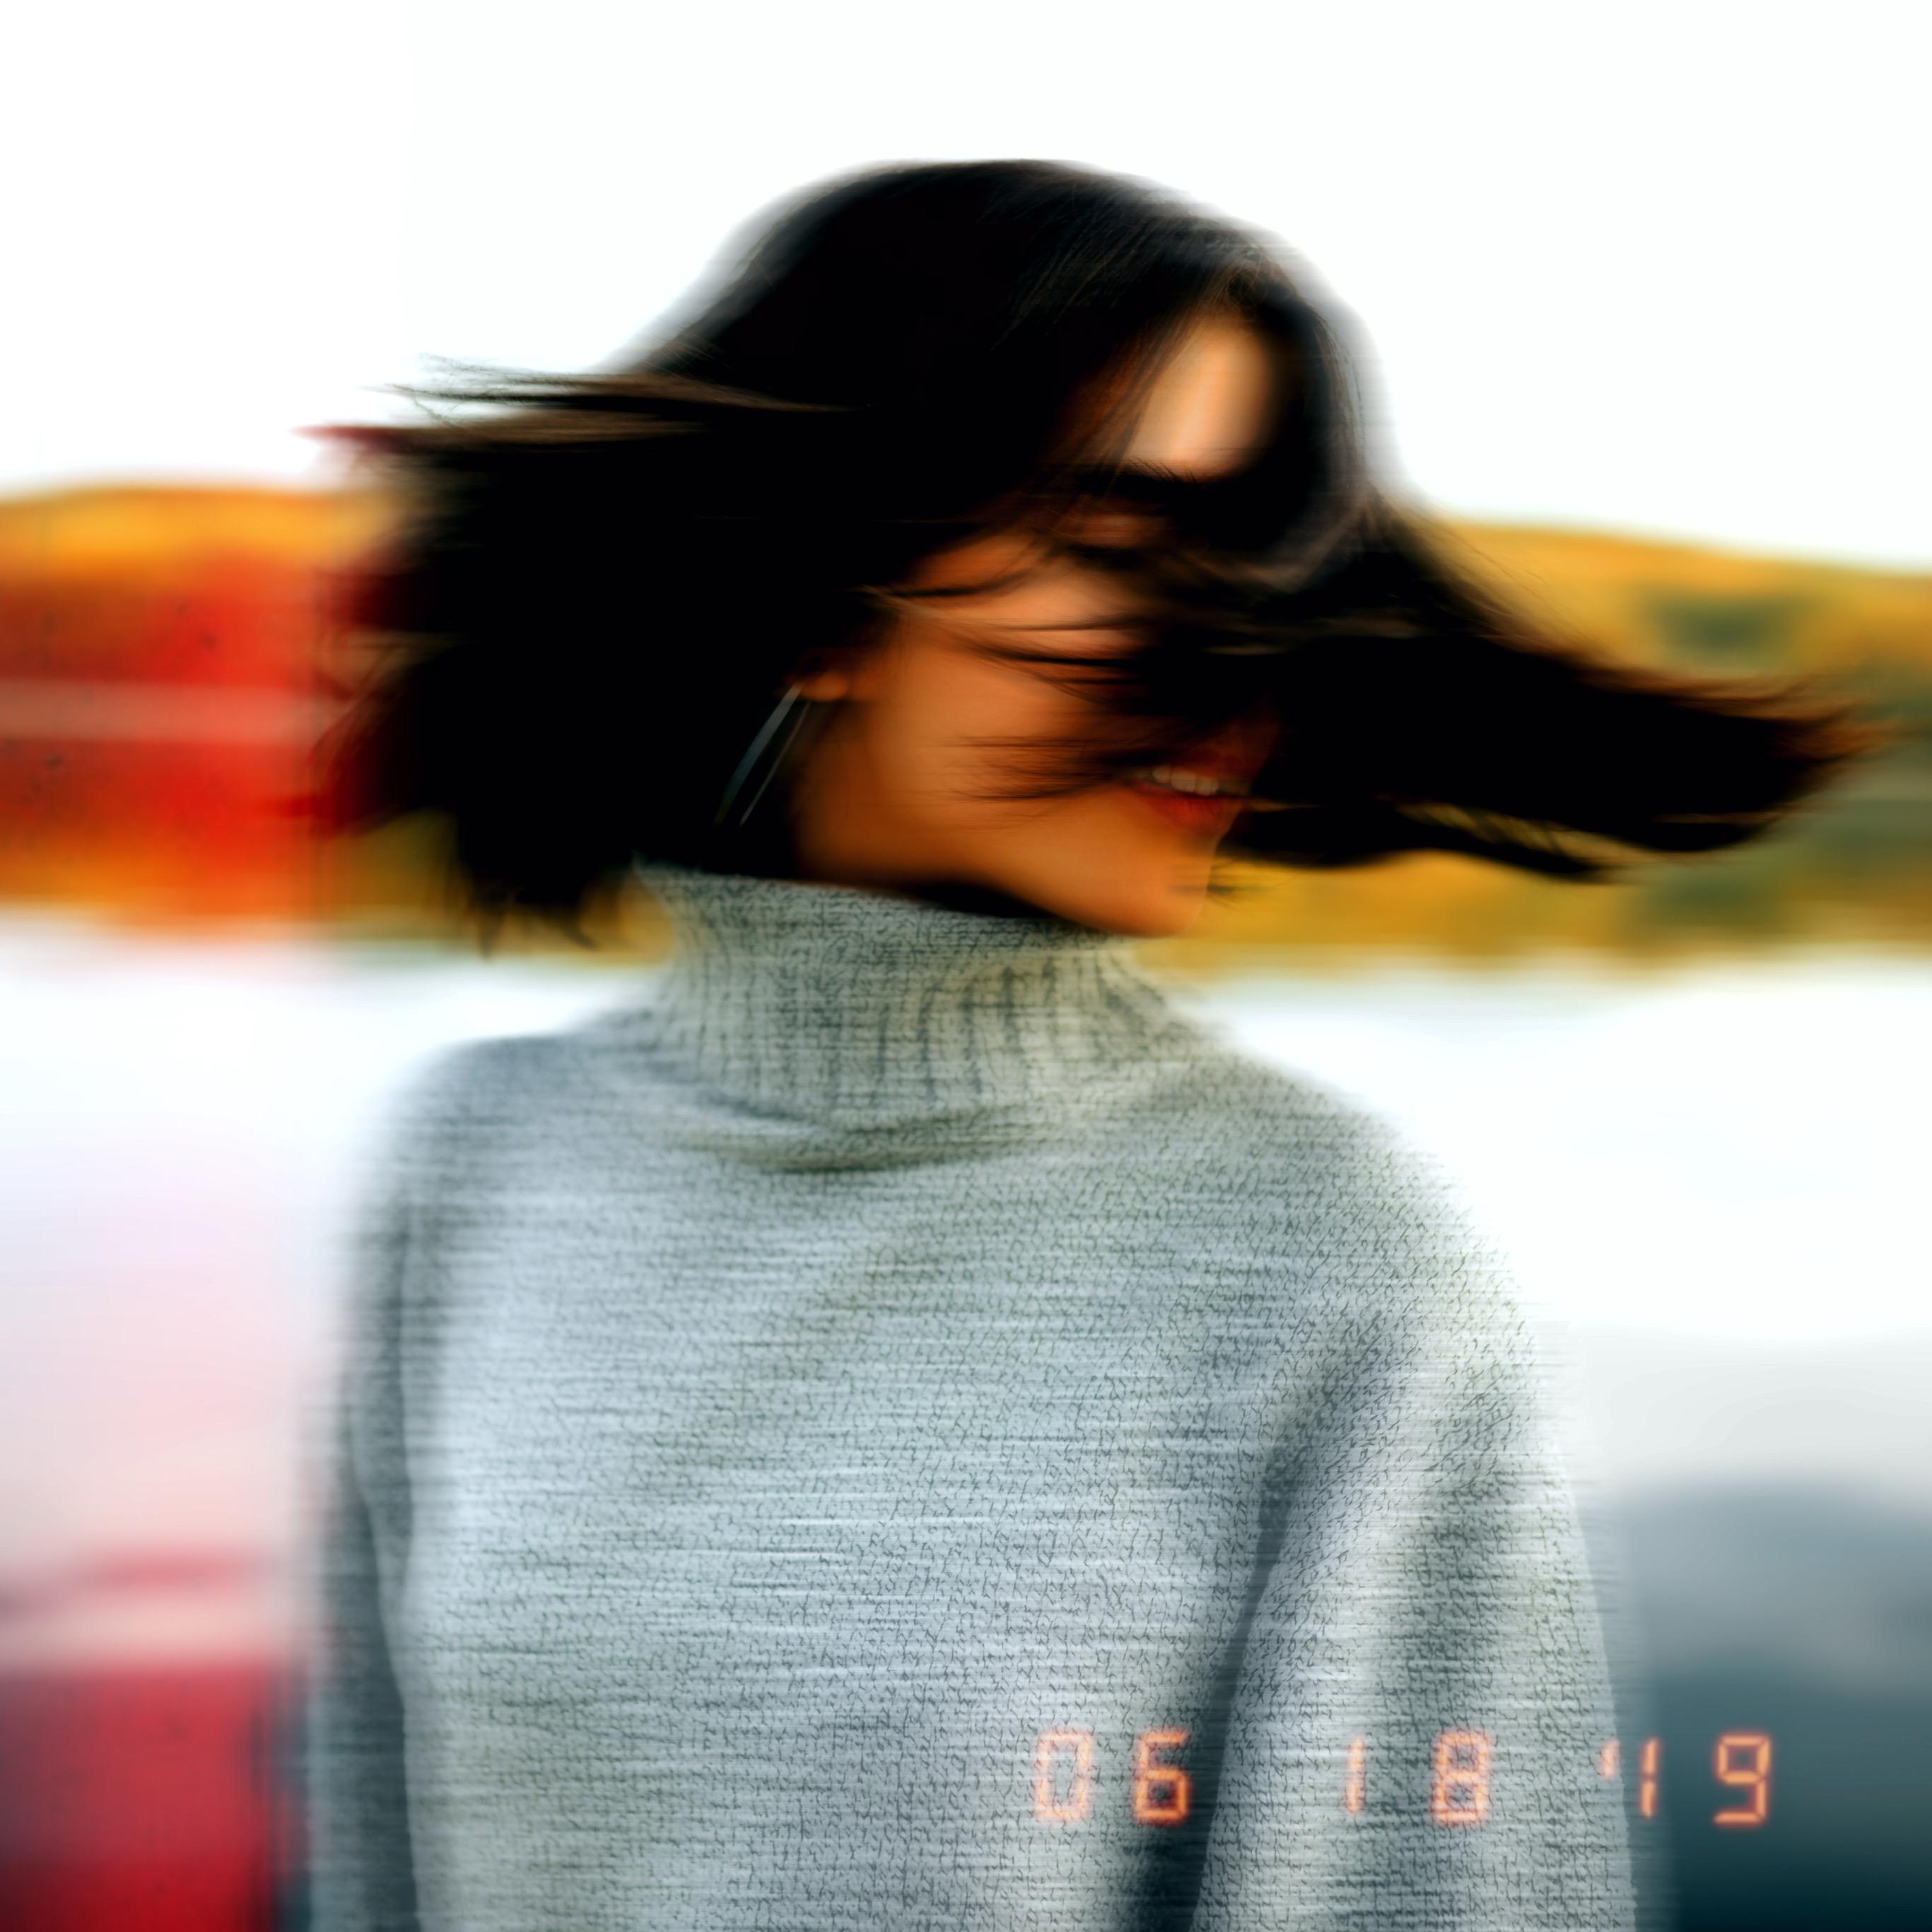 #freetoedit #motion #motionblur #motioneffect #blur #blurry #blureffect #blurryface #blured#remixit #vhs